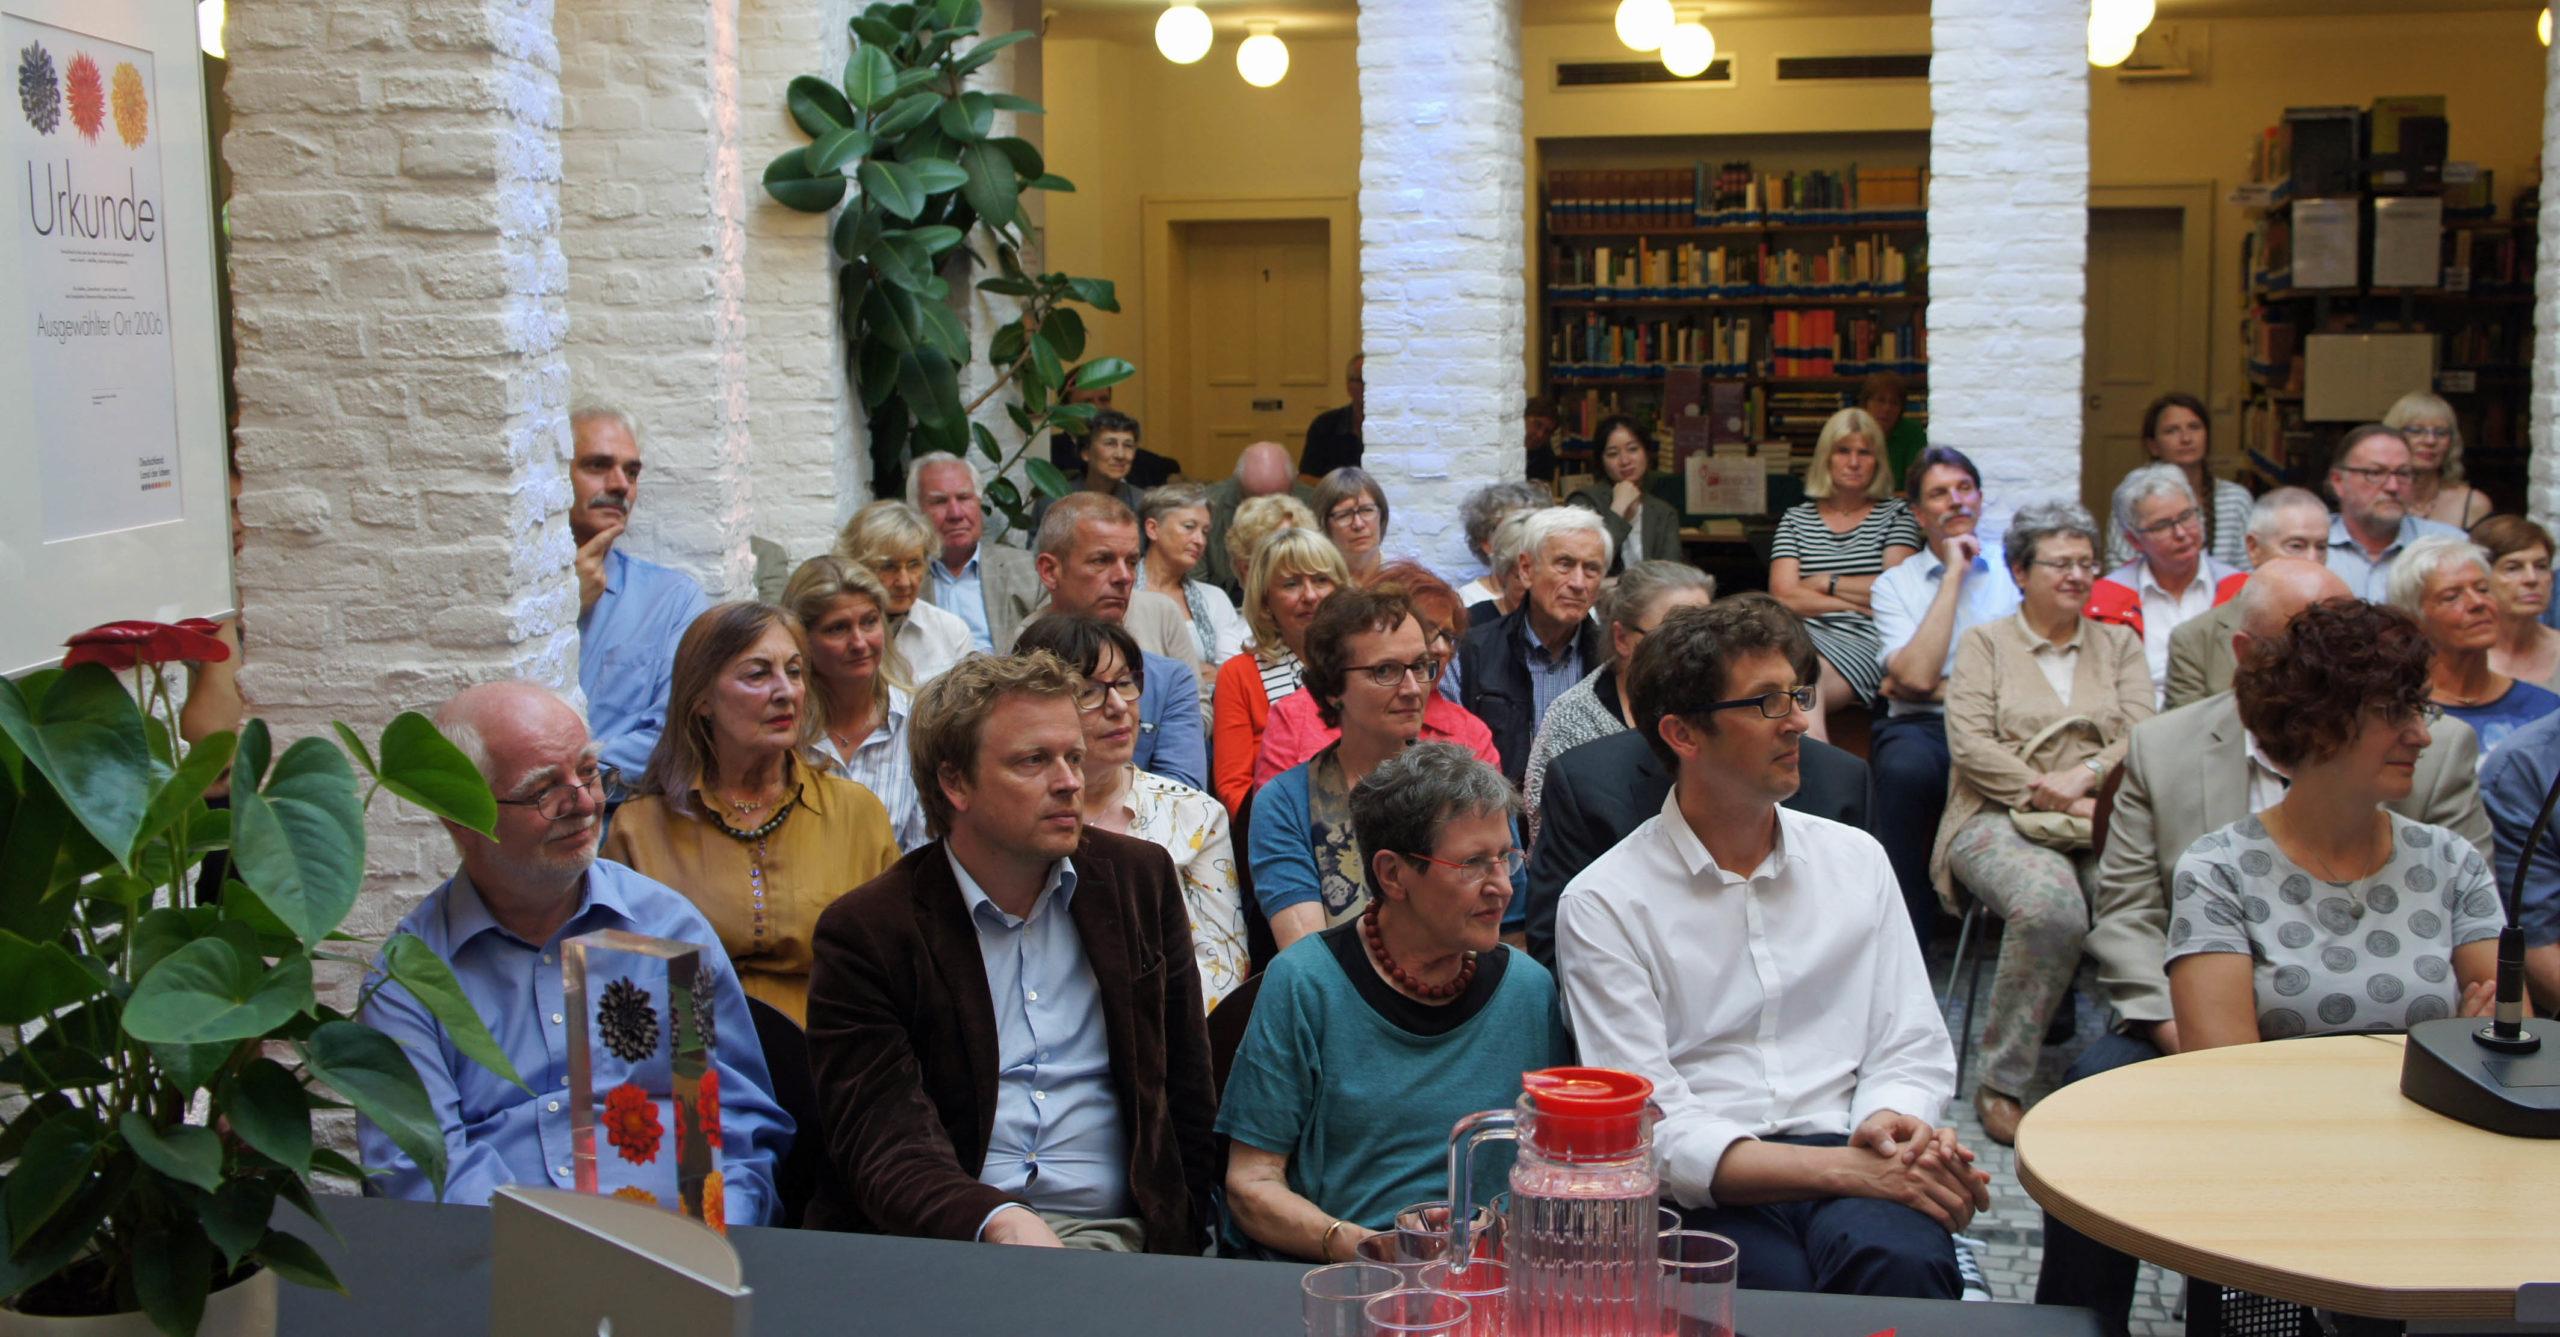 Straelen audience